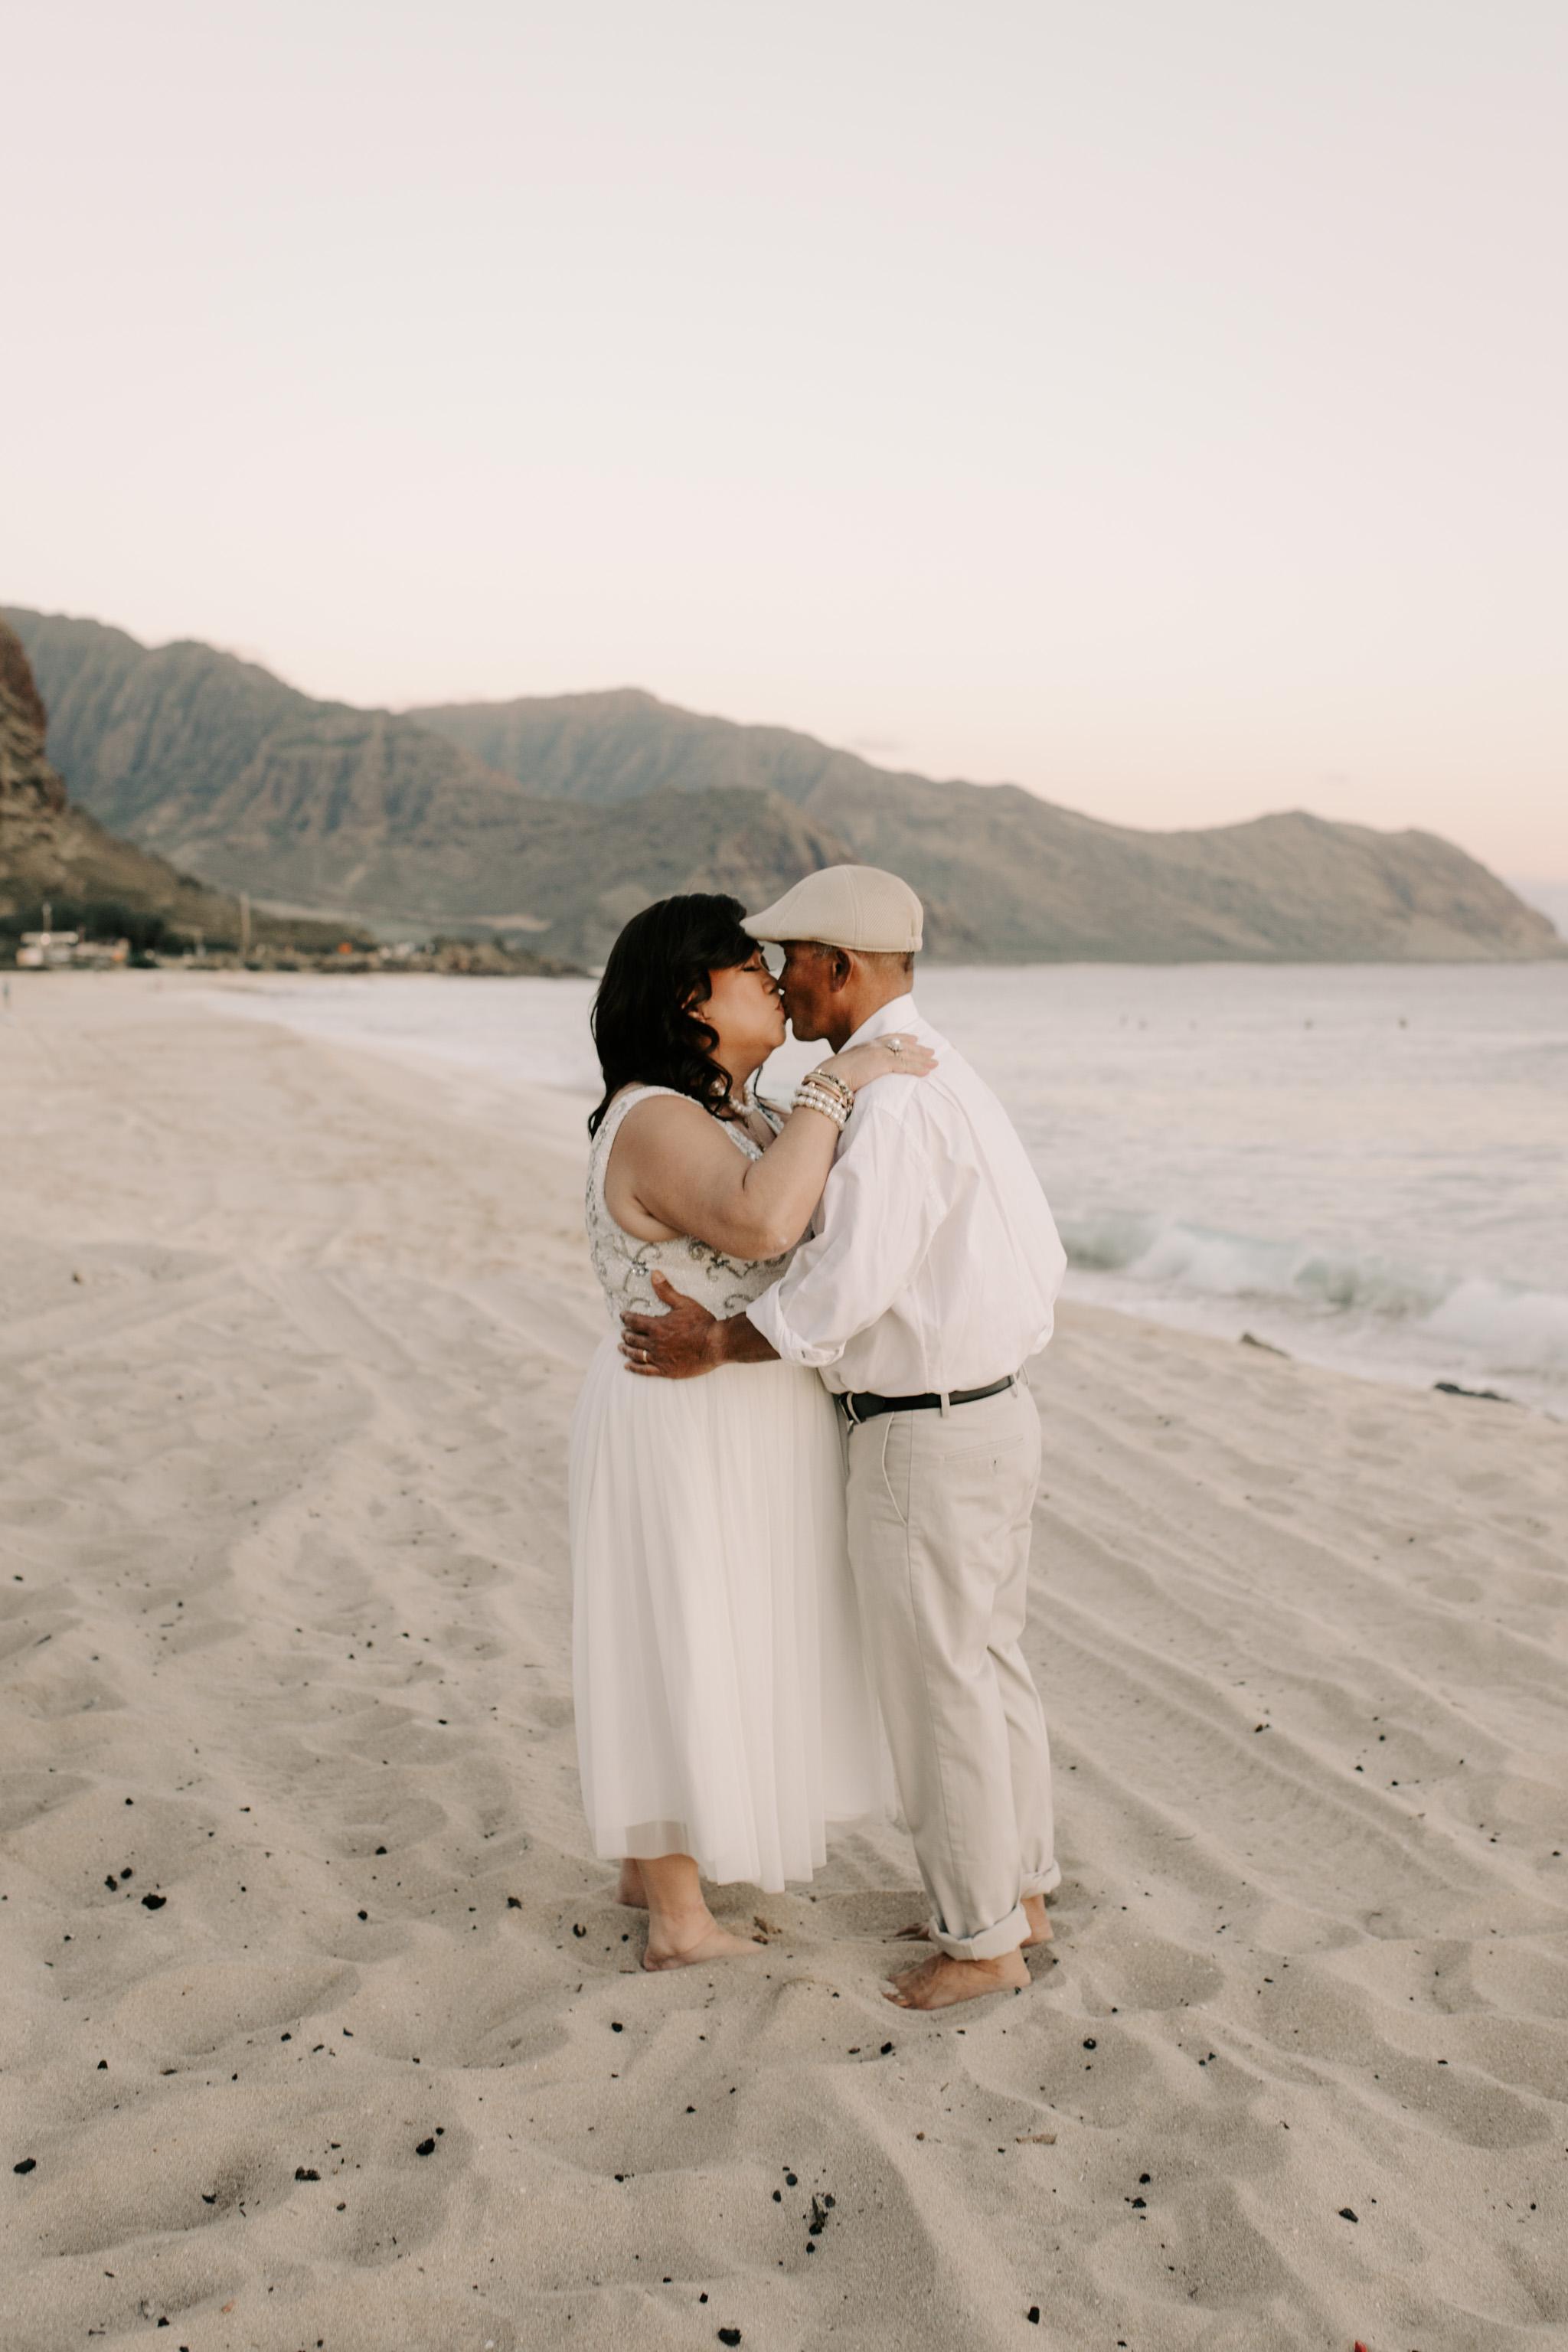 Mama Starrr and Papa Starrr renewing their vows at Yokohama Bay - Patrick Starrr Hawaii Family Photos by Hawaii family photographer Desiree Leilani